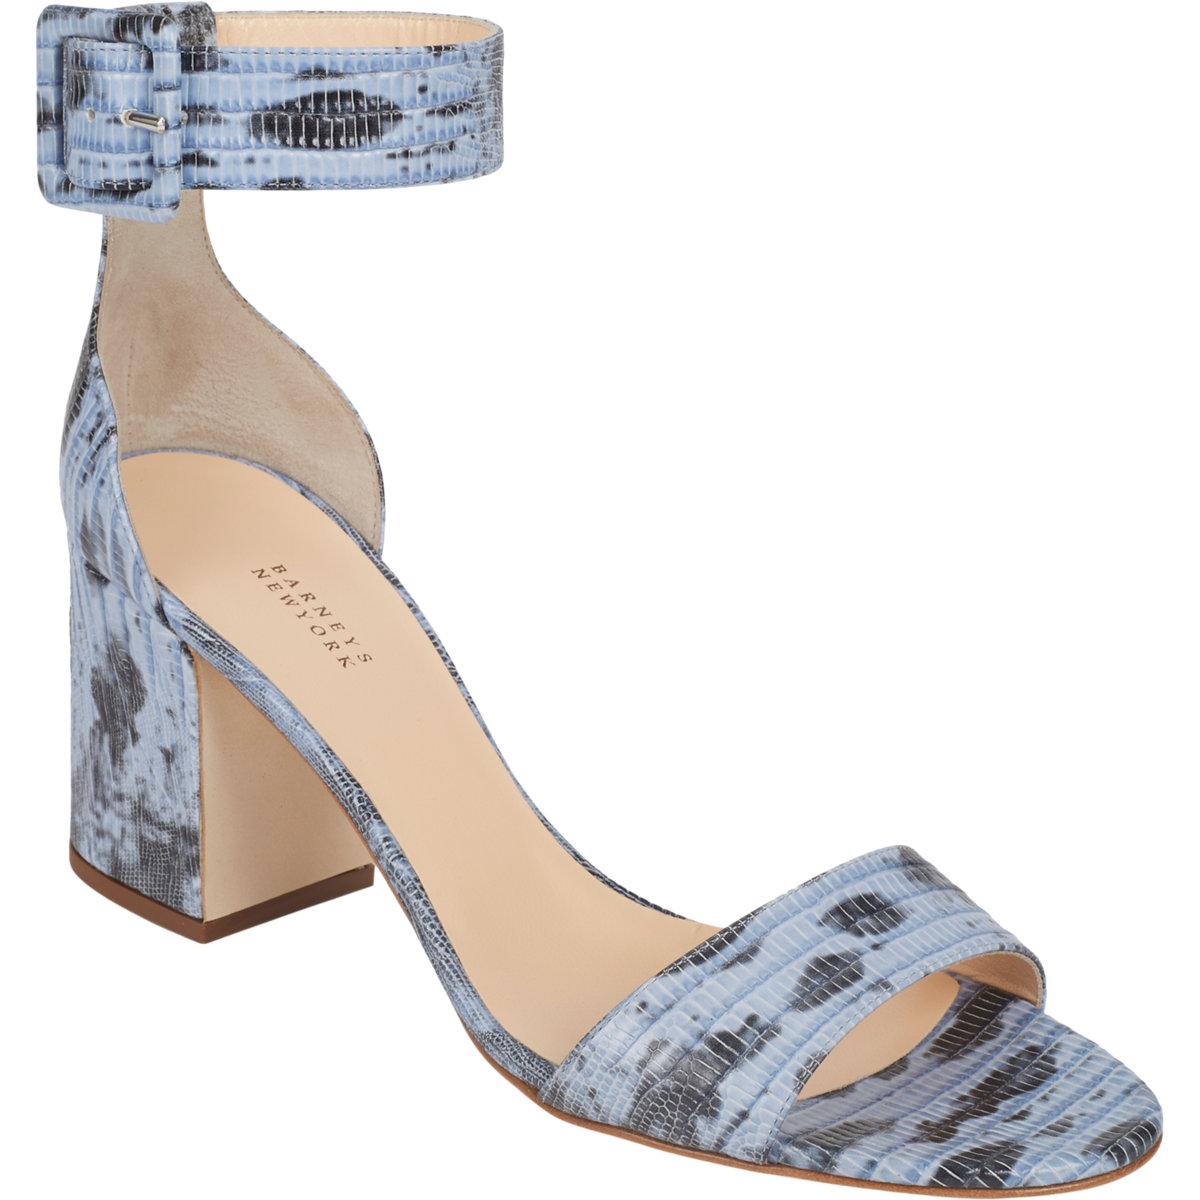 Barneys New York Ankle-Strap Sandal